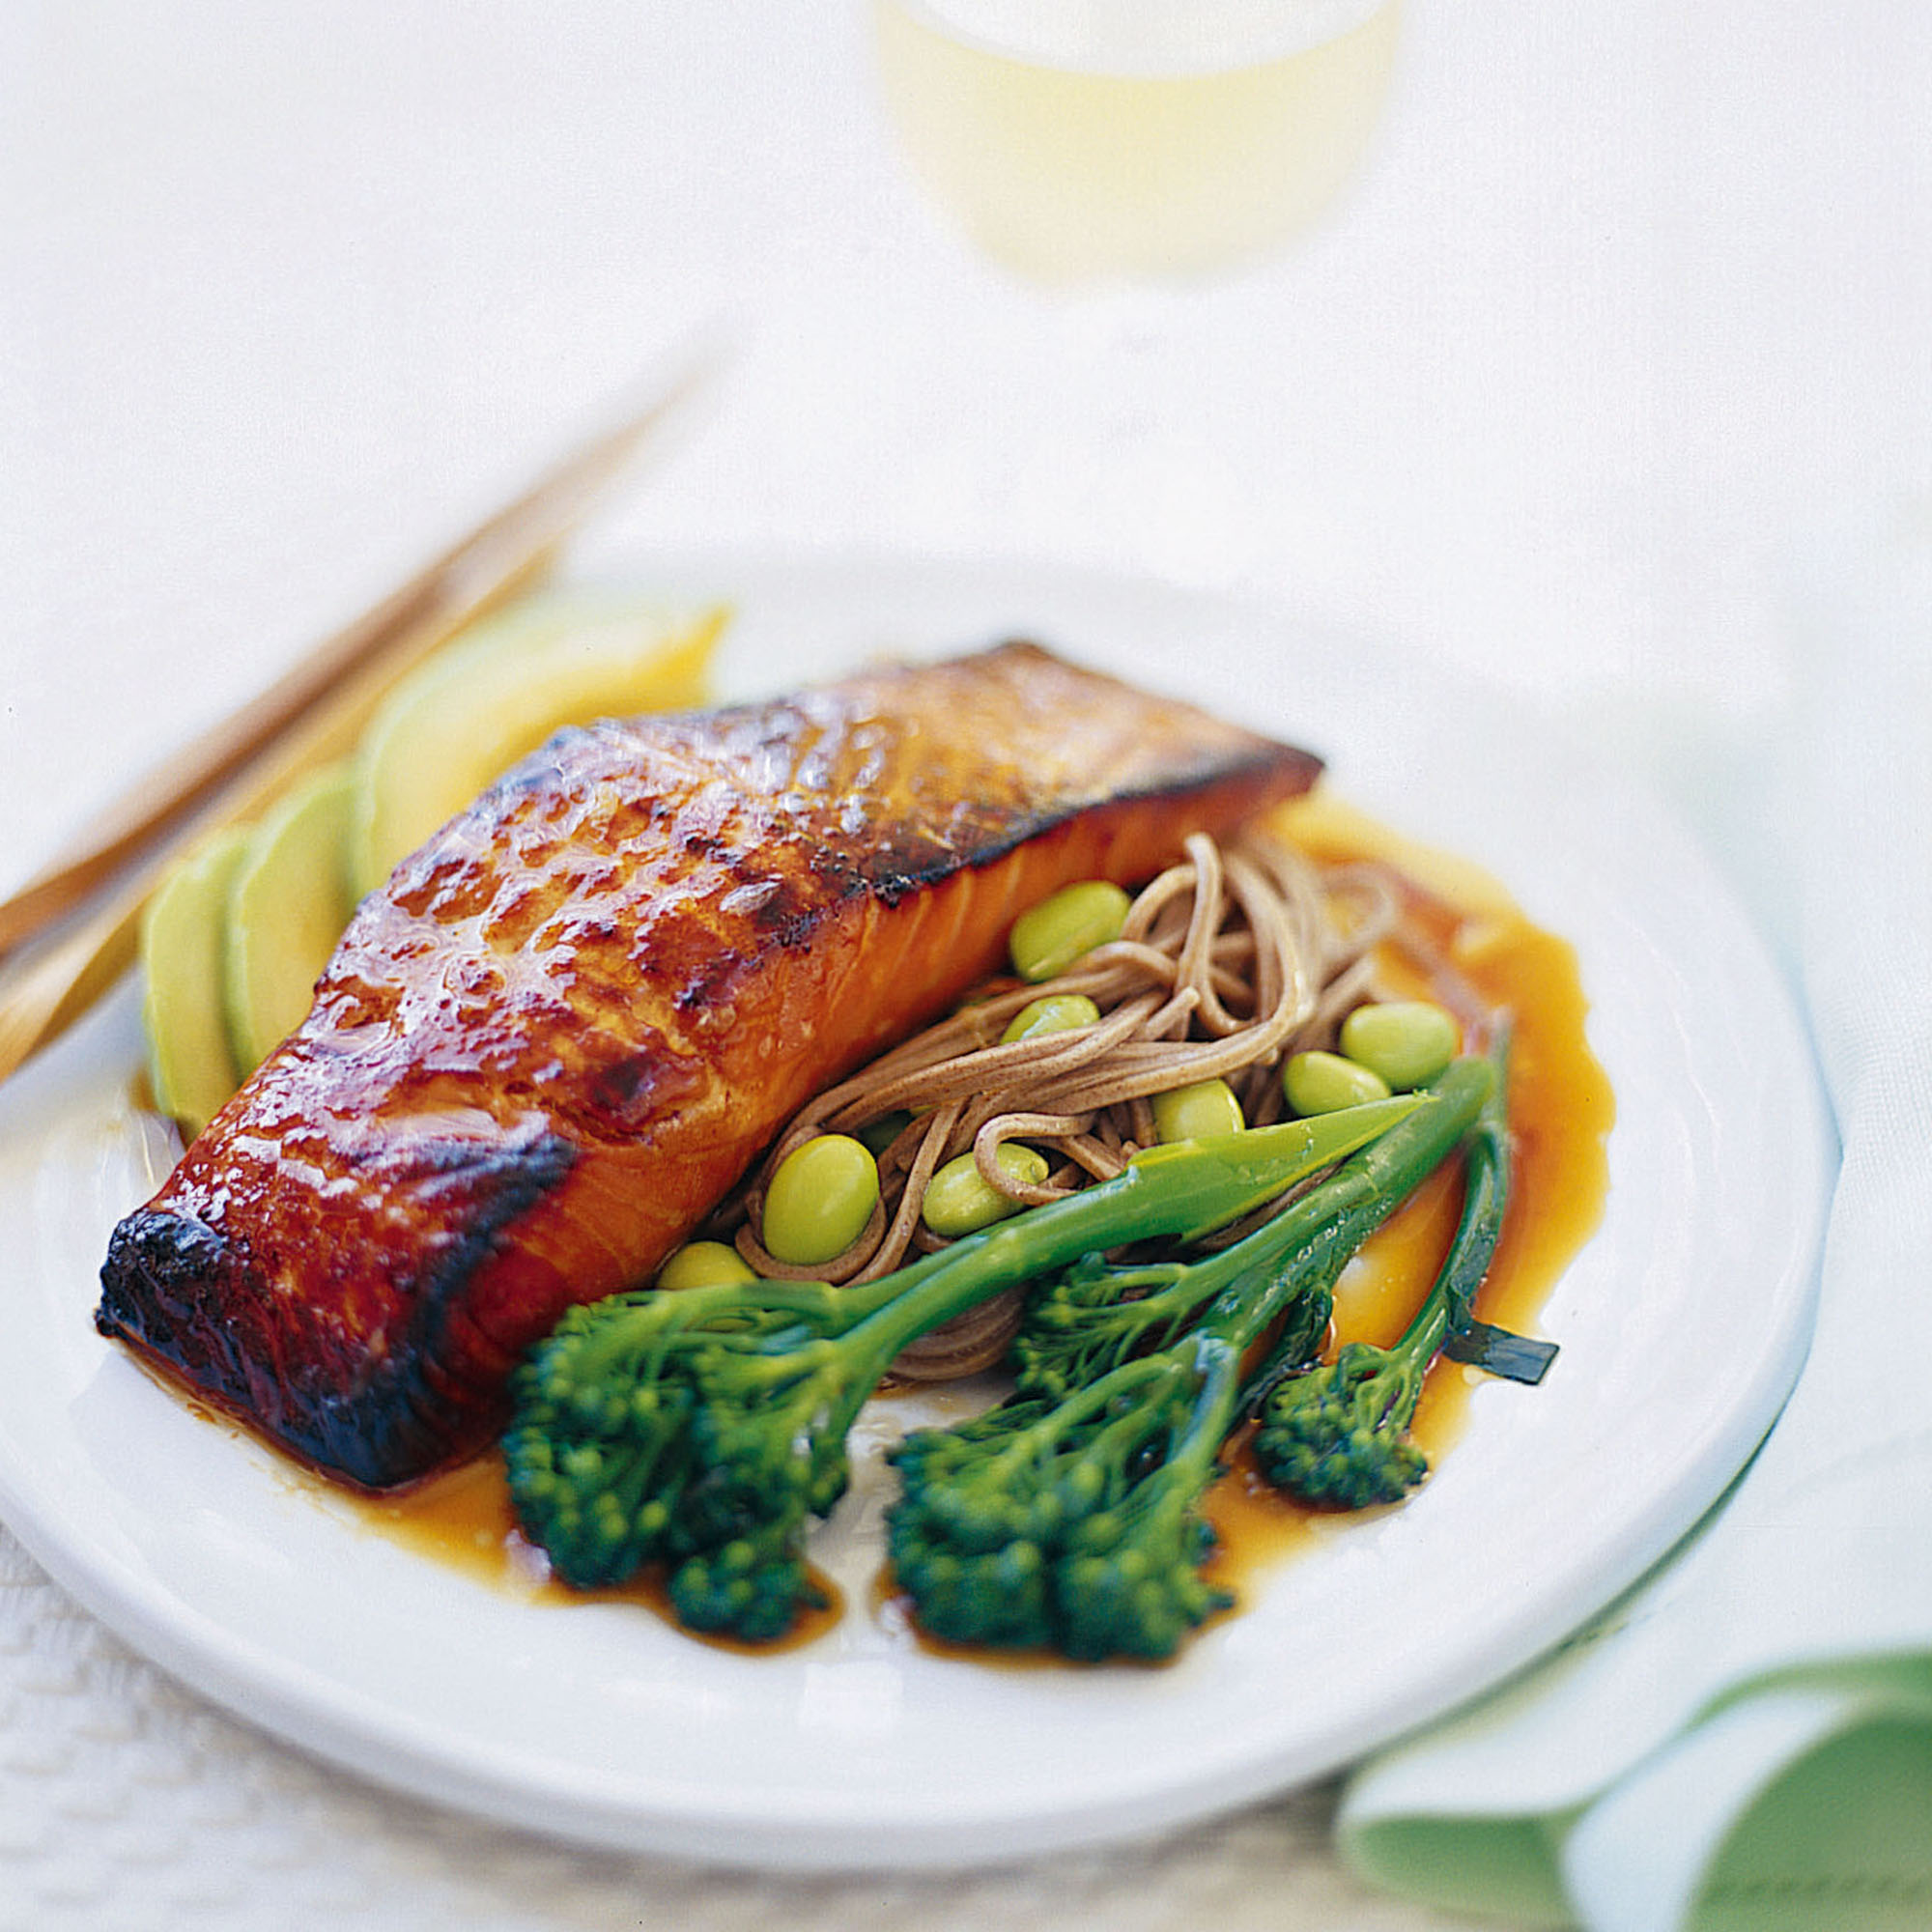 Salmon Teriyaki with Soba Noodles recipe-salmon recipes-recipe ideas-new recipes-woman and home